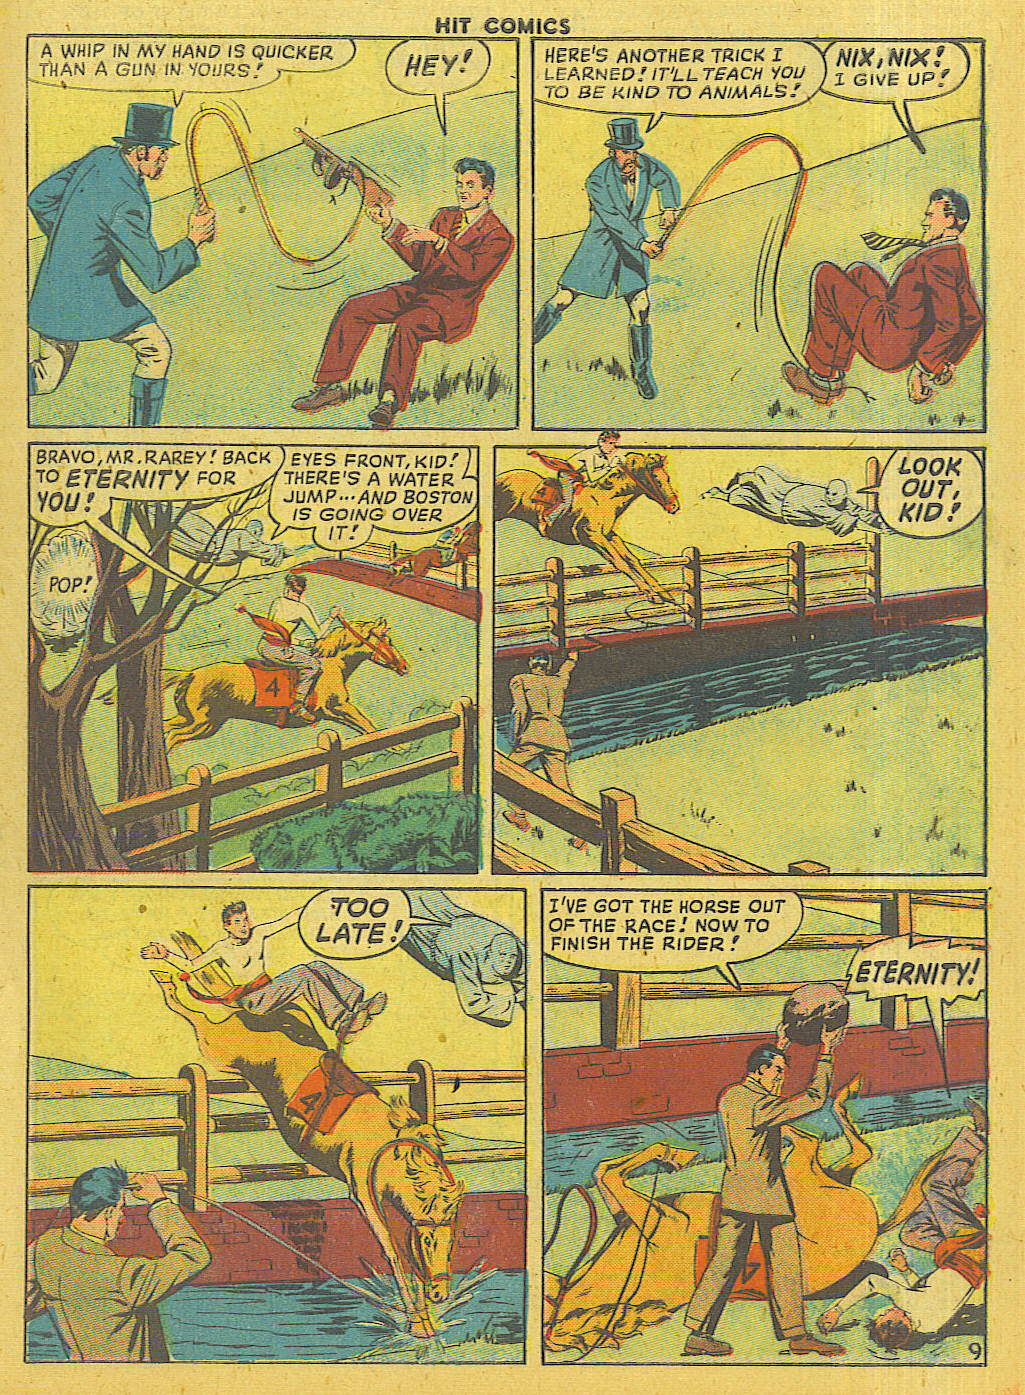 Read online Hit Comics comic -  Issue #56 - 11